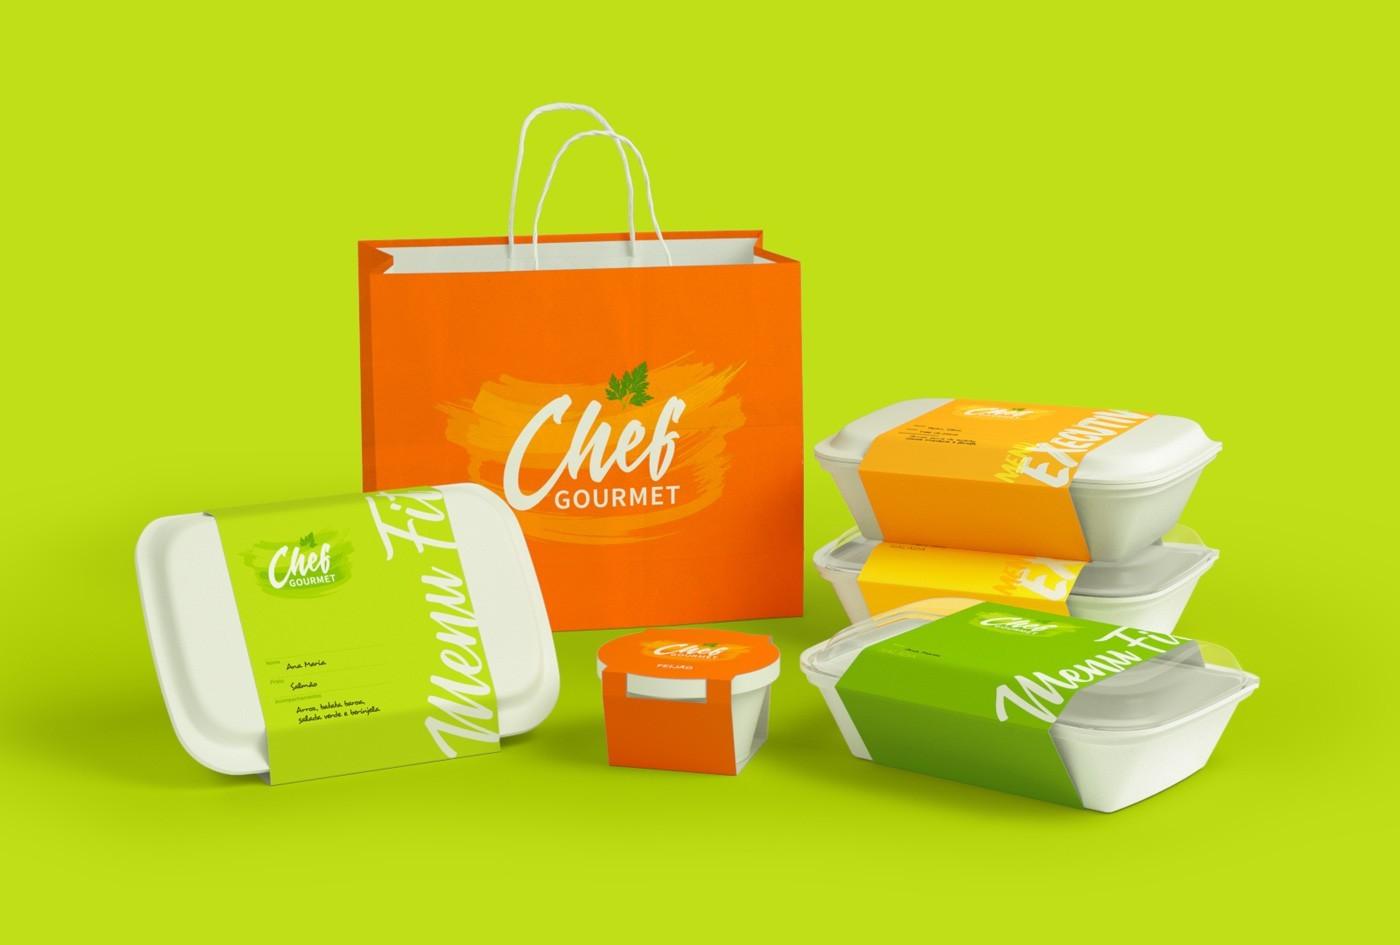 Ricebean Studio – Chef Gourmet Brand Identity